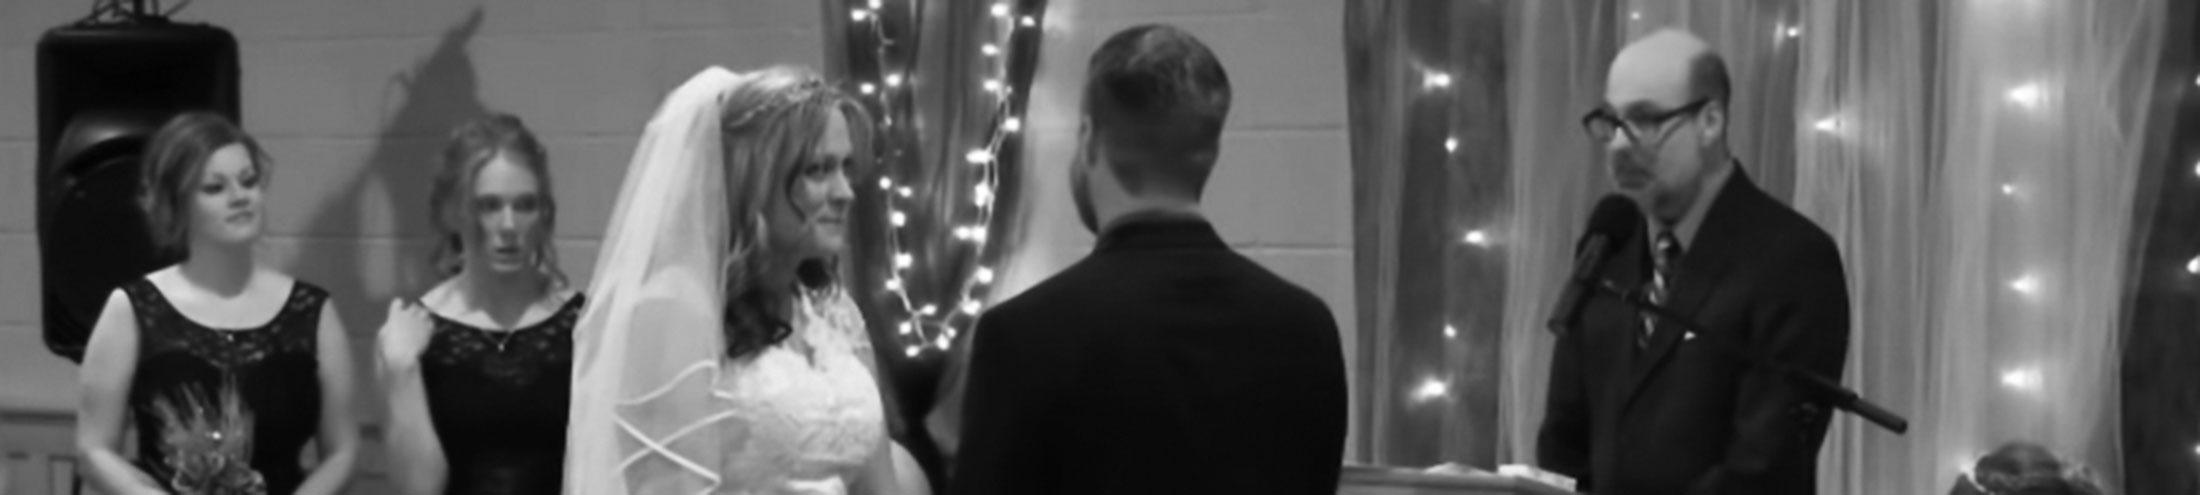 Minnesota Wedding Vows Minister